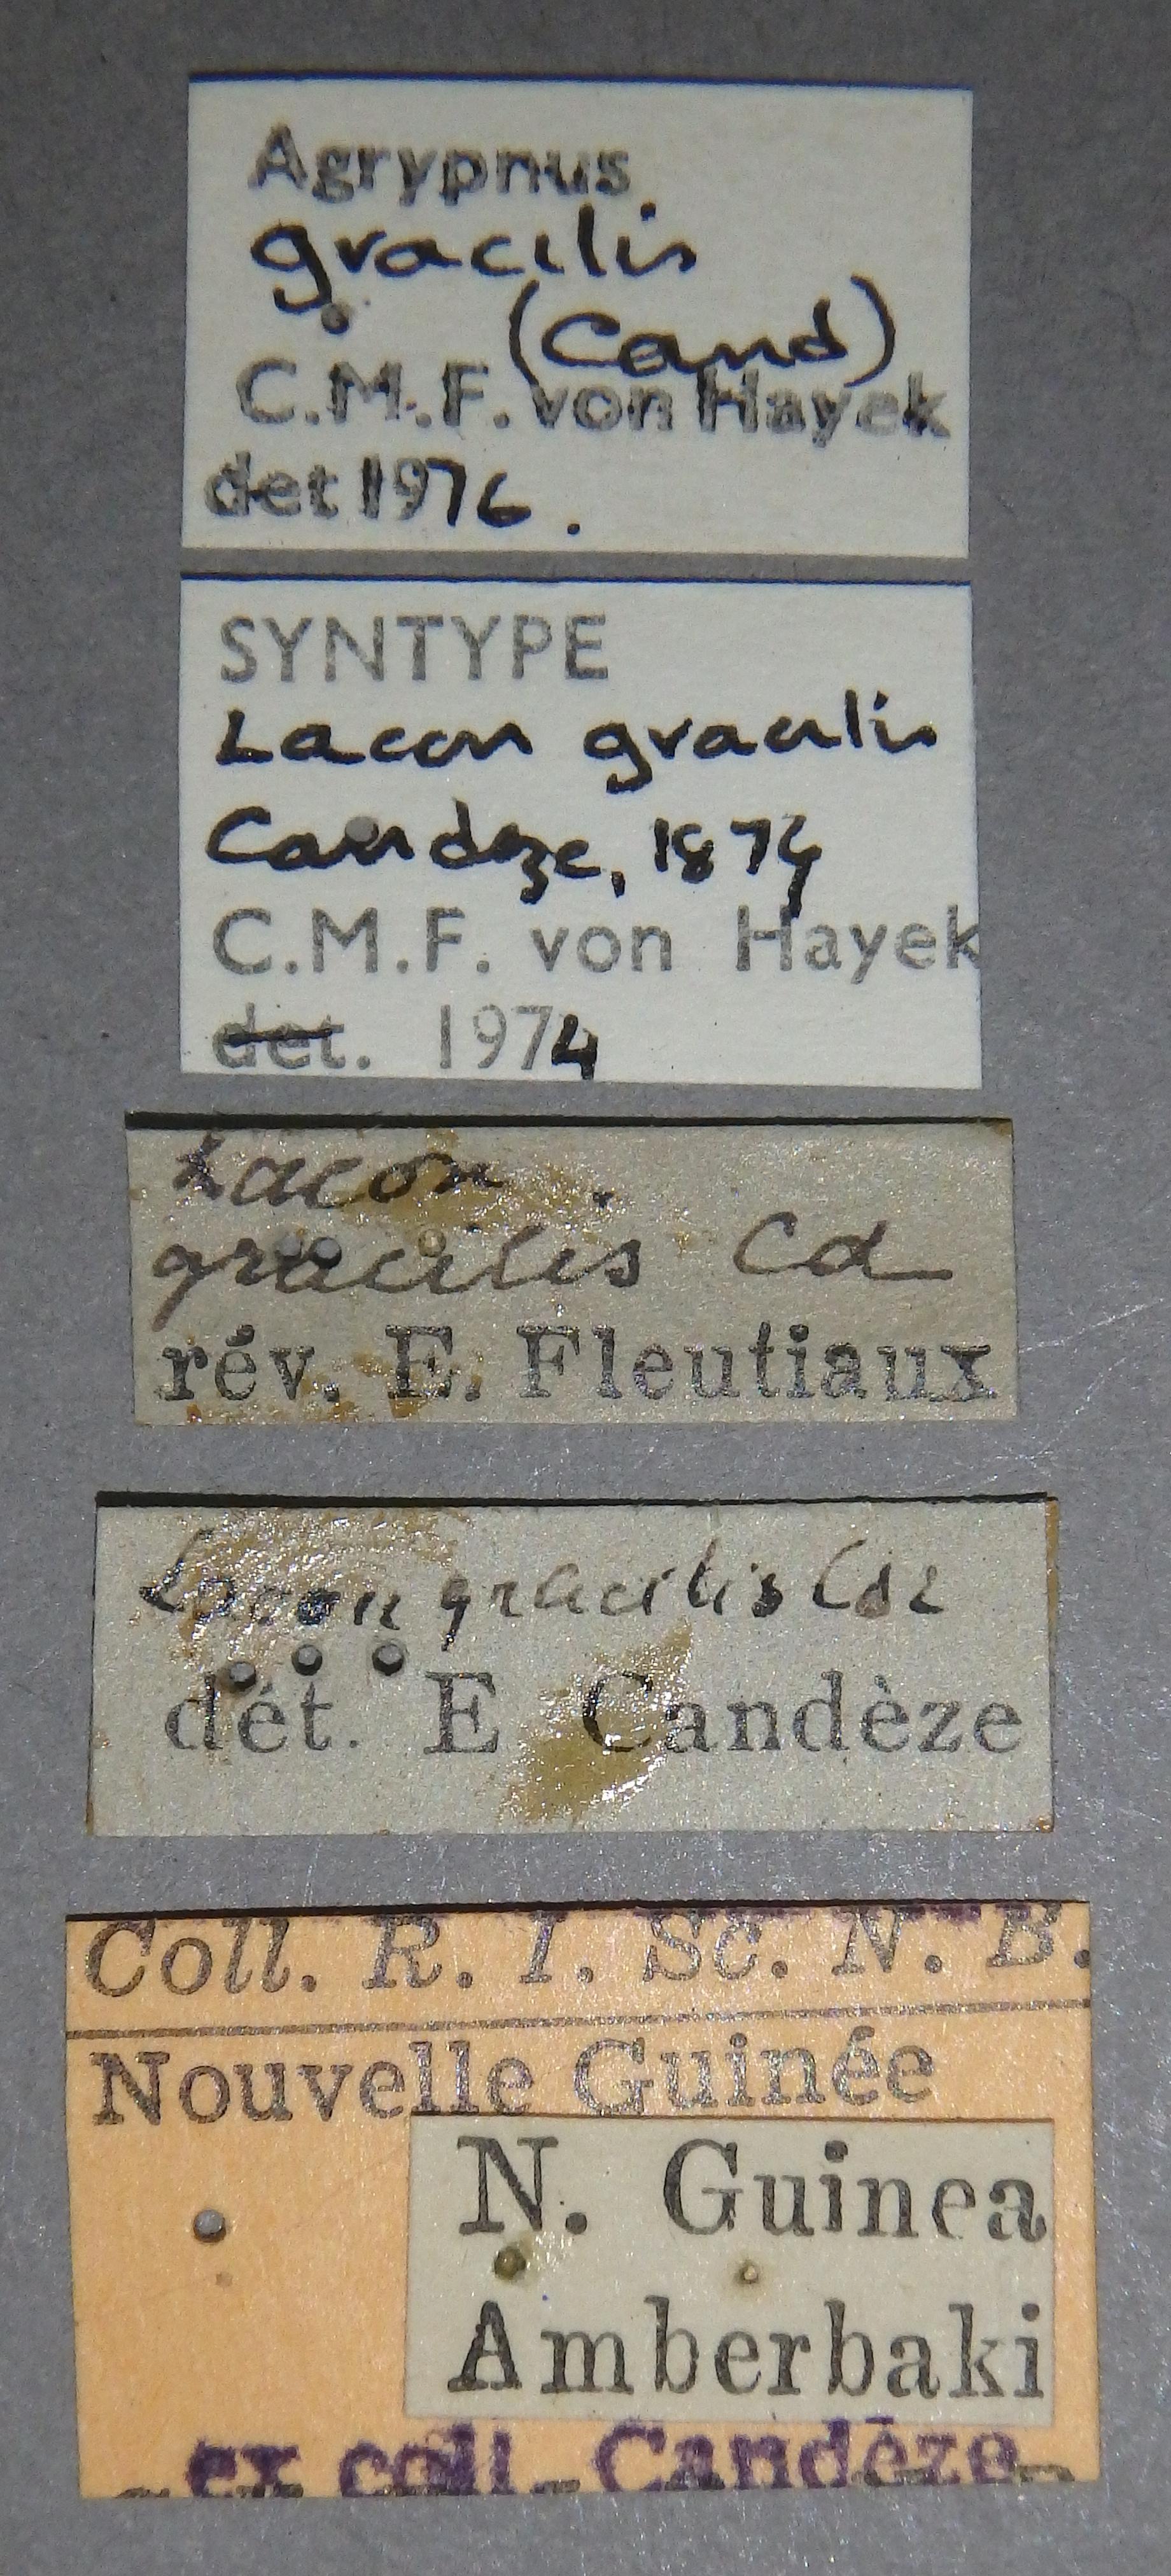 Lacon gracilis st10 Lb.JPG